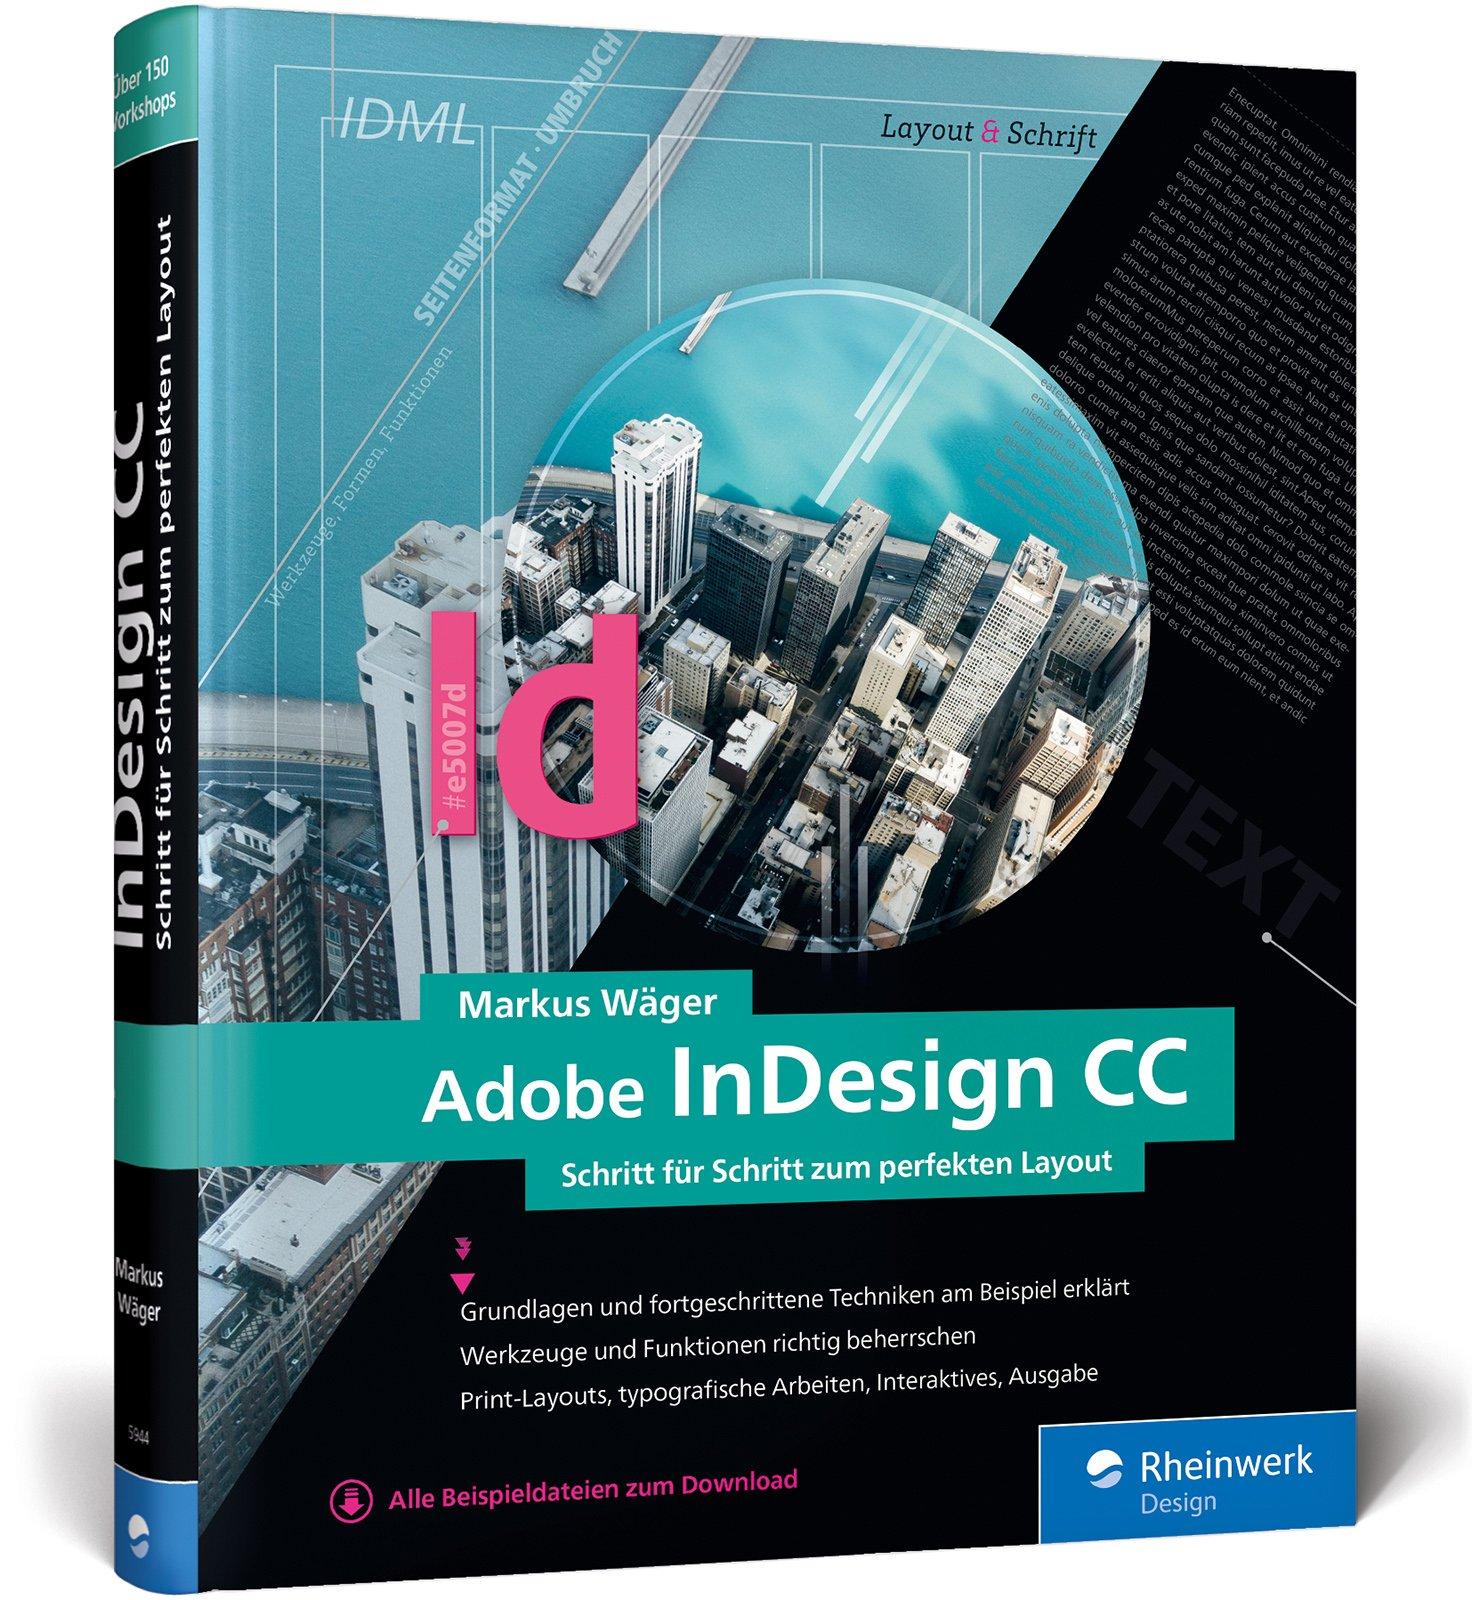 Adobe InDesign CC 2013 Trial Free Download - GaZ